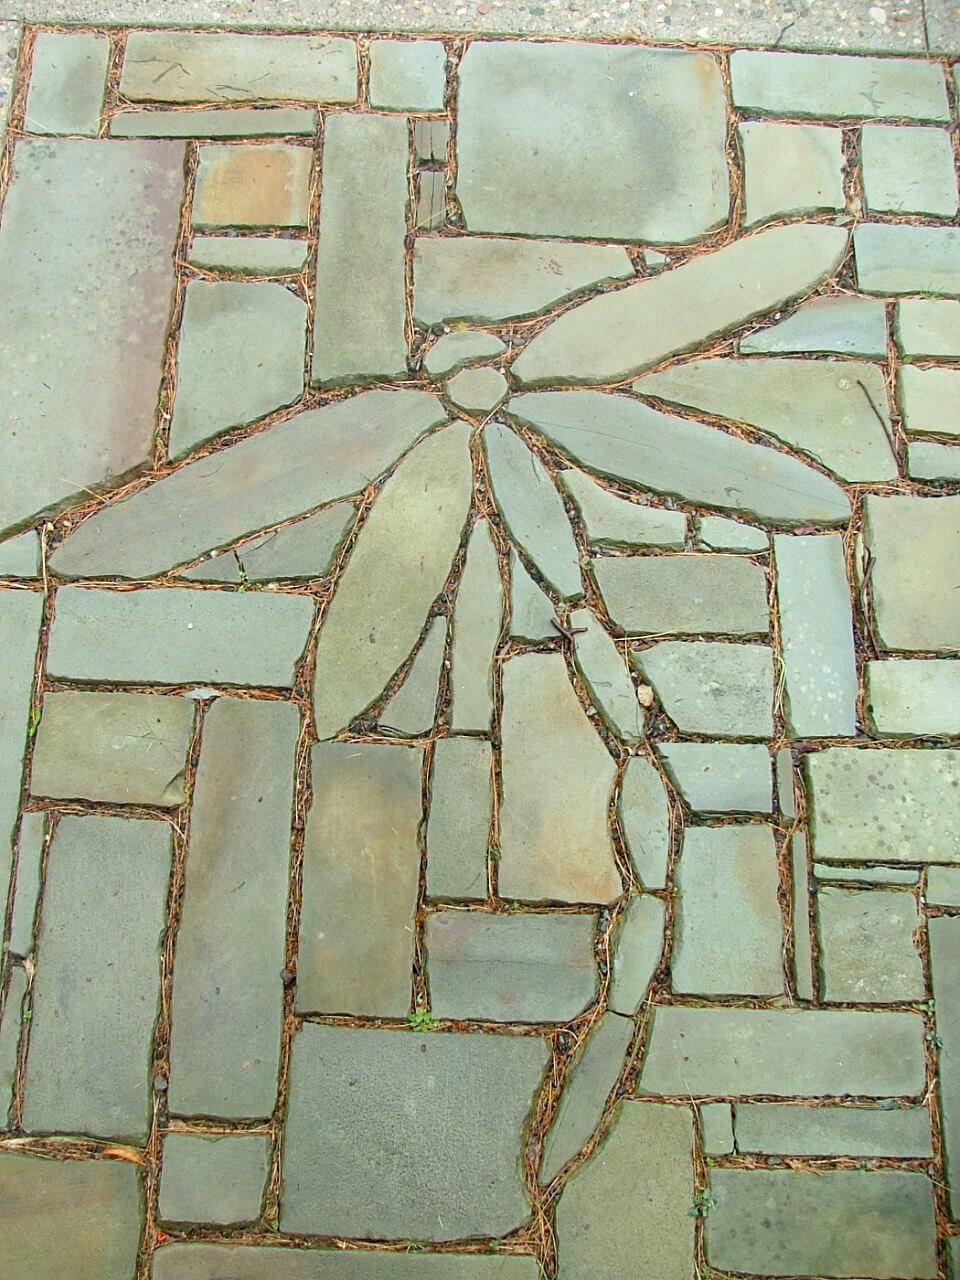 Sandstone Dragonfly Garden Paver Stone